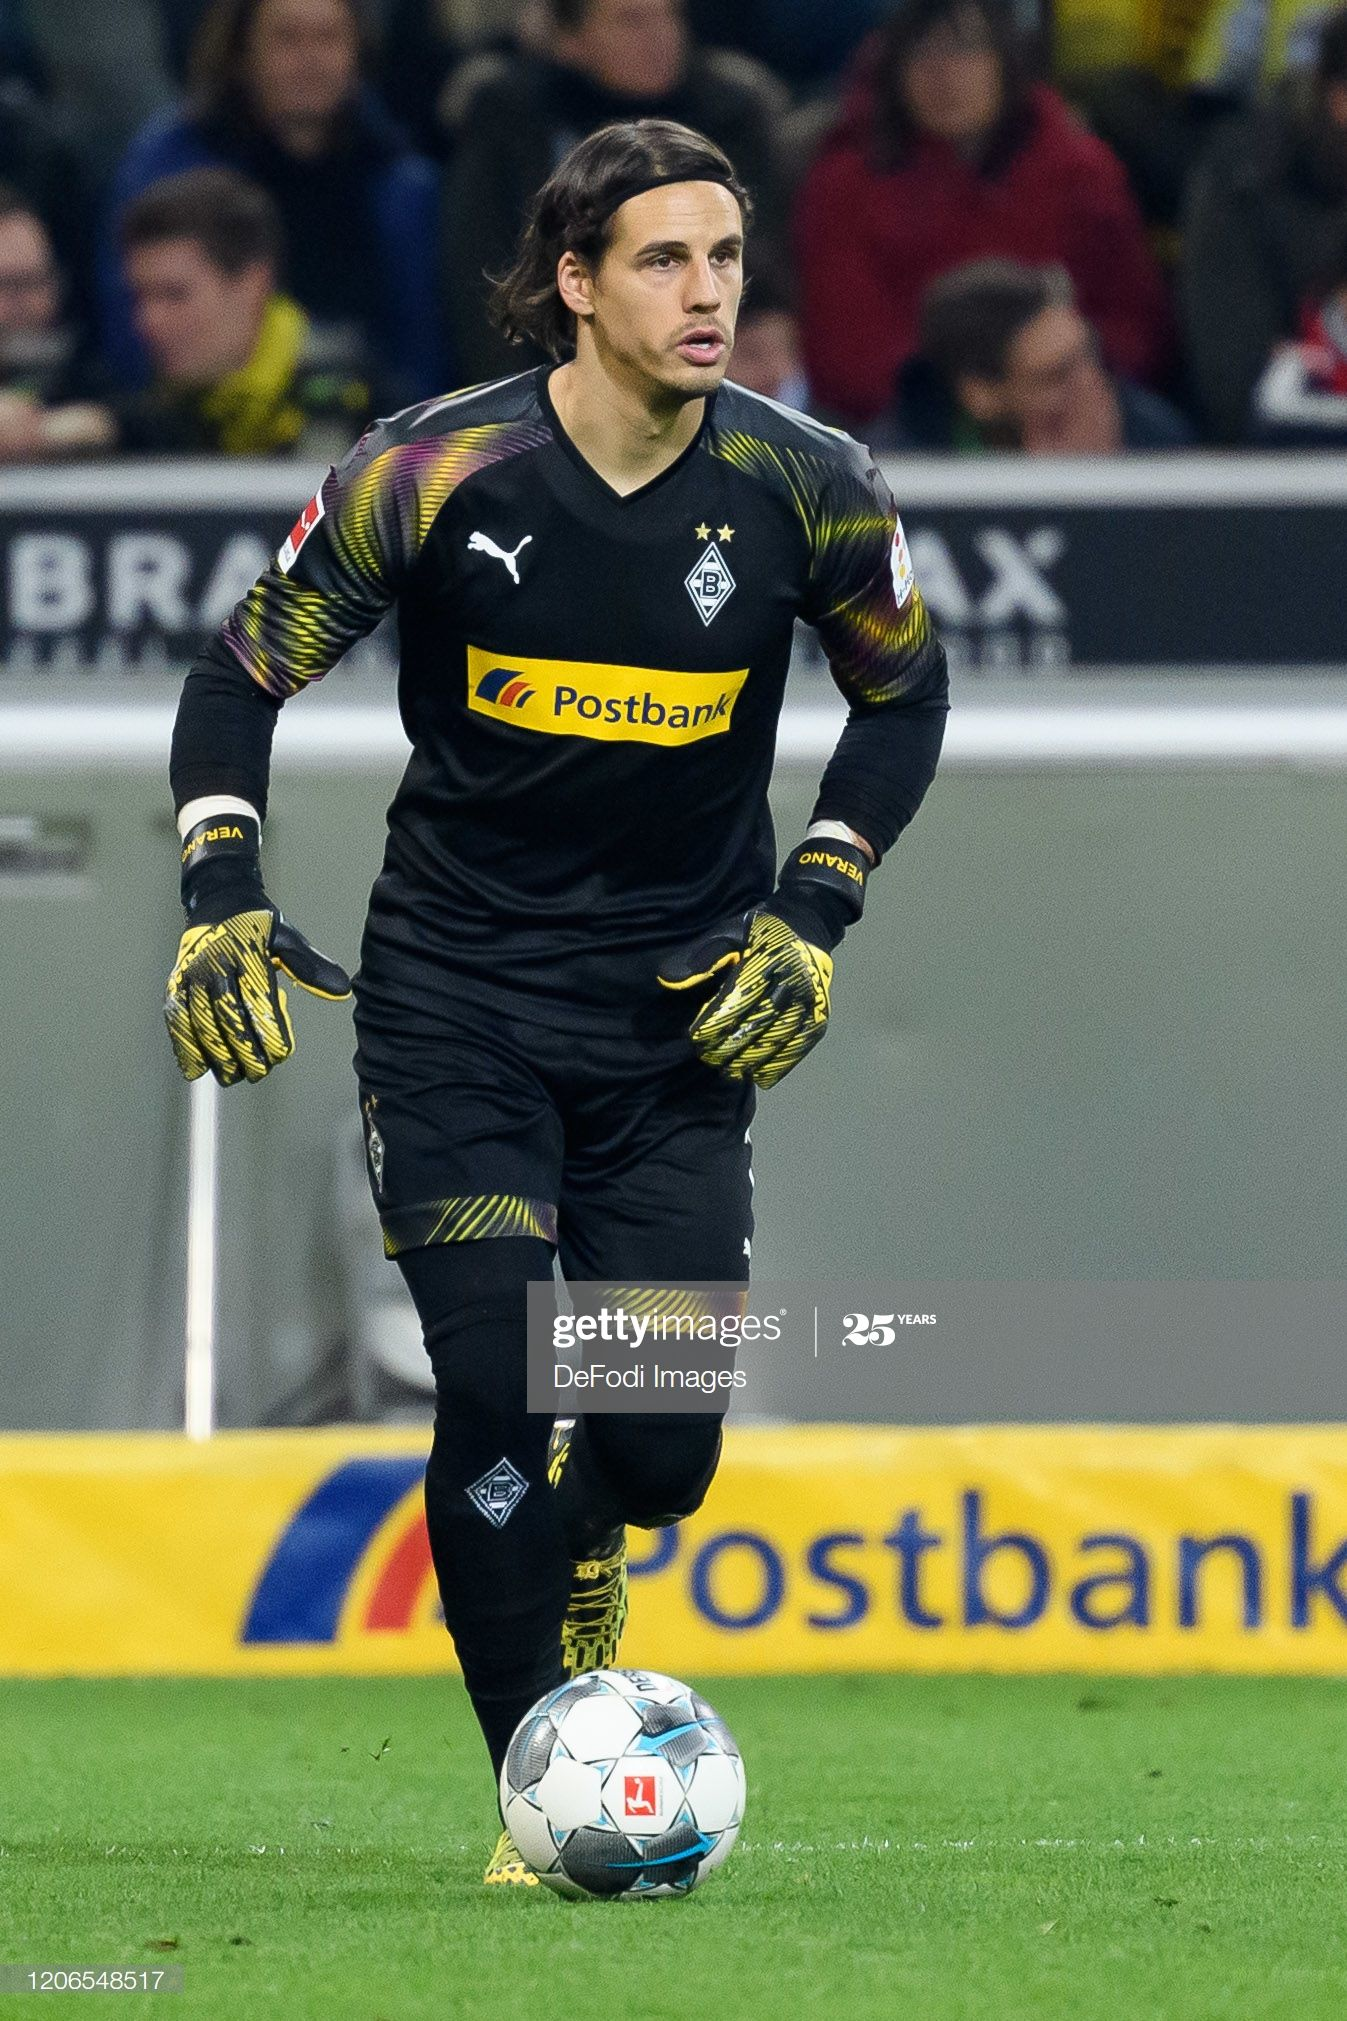 Fotografia De Noticias Goalkeeper Yann Sommer Of Borussia En 2020 Borussia Dortmund Dortmund Imagen De Alta Resolucion